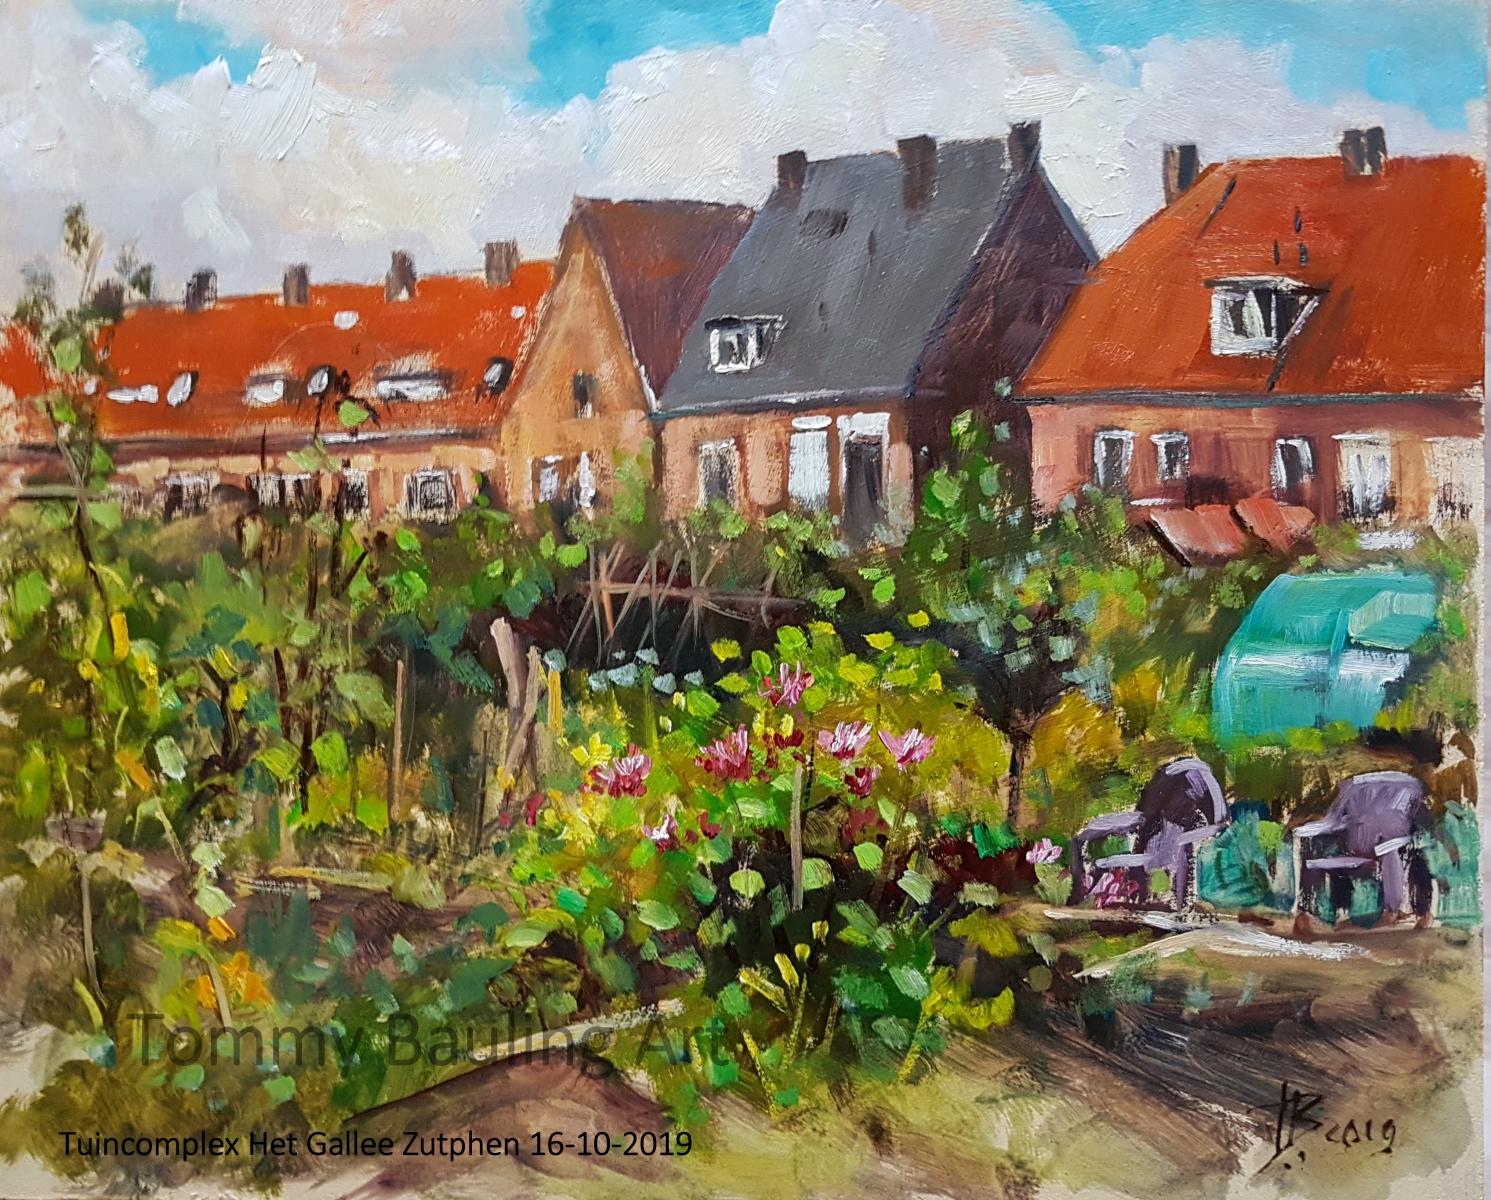 Tuincomplex-Het-Gallee-Zutphen-16-10-2016